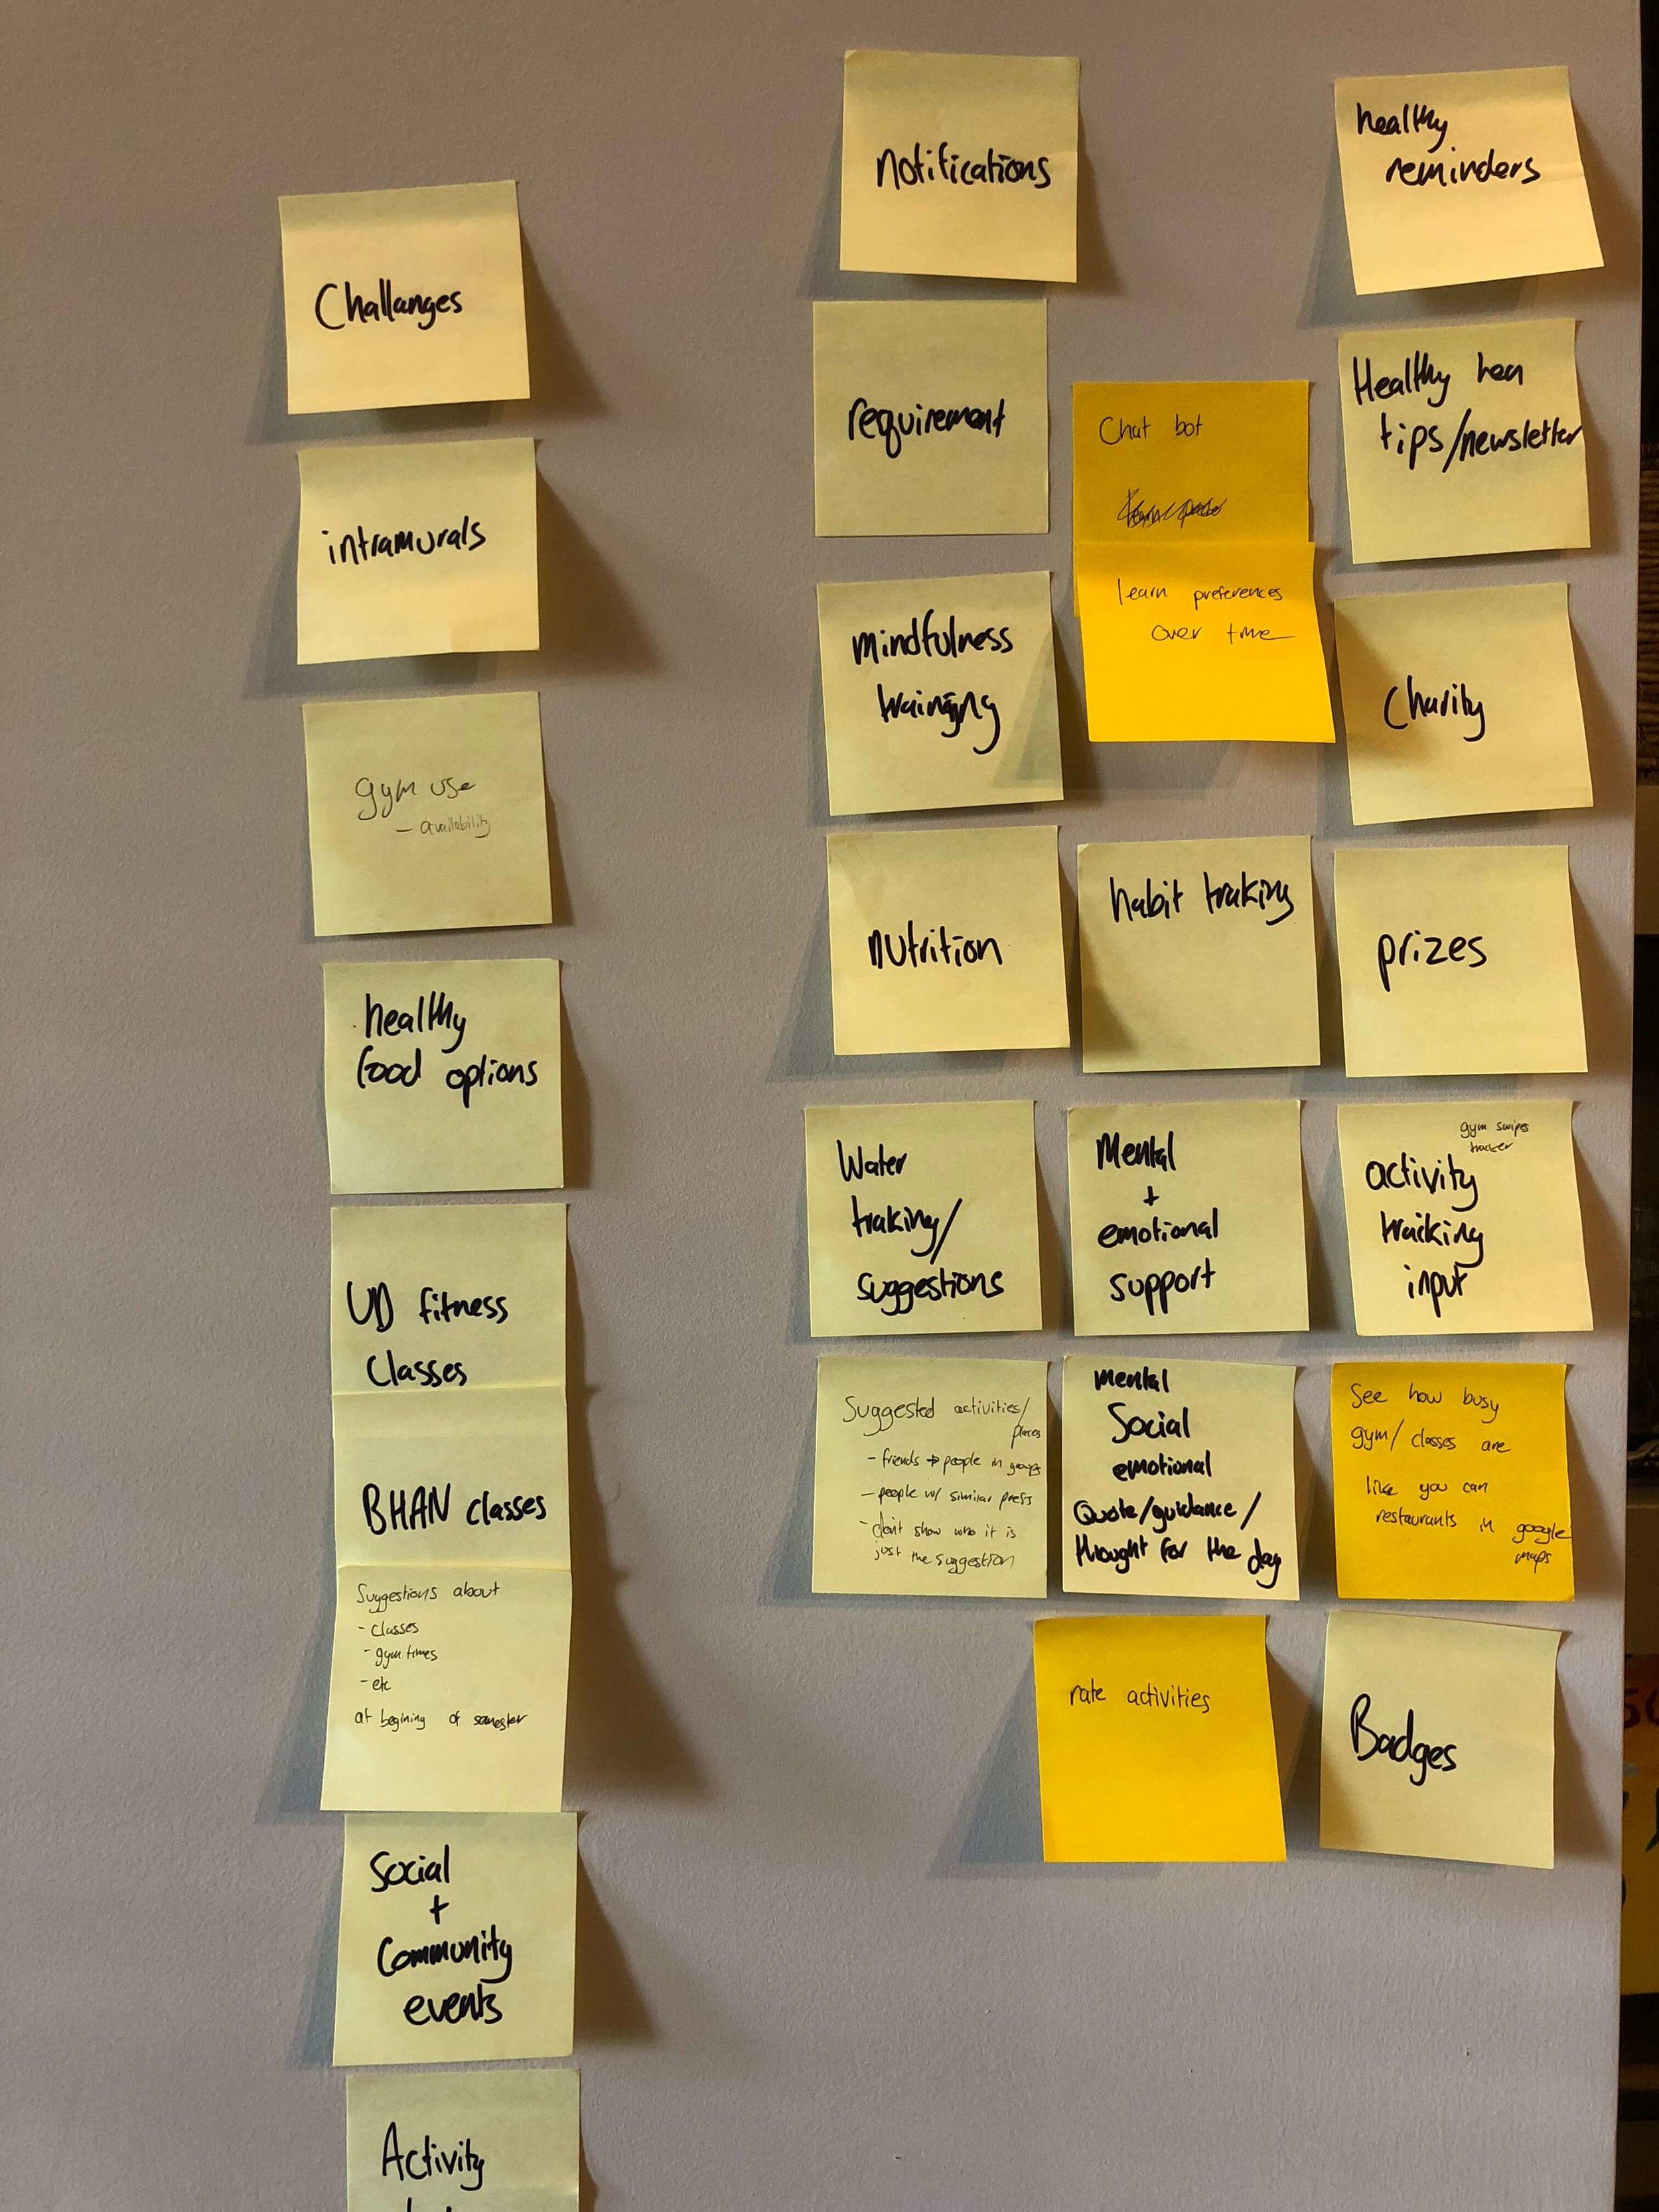 brainstorm2.JPG